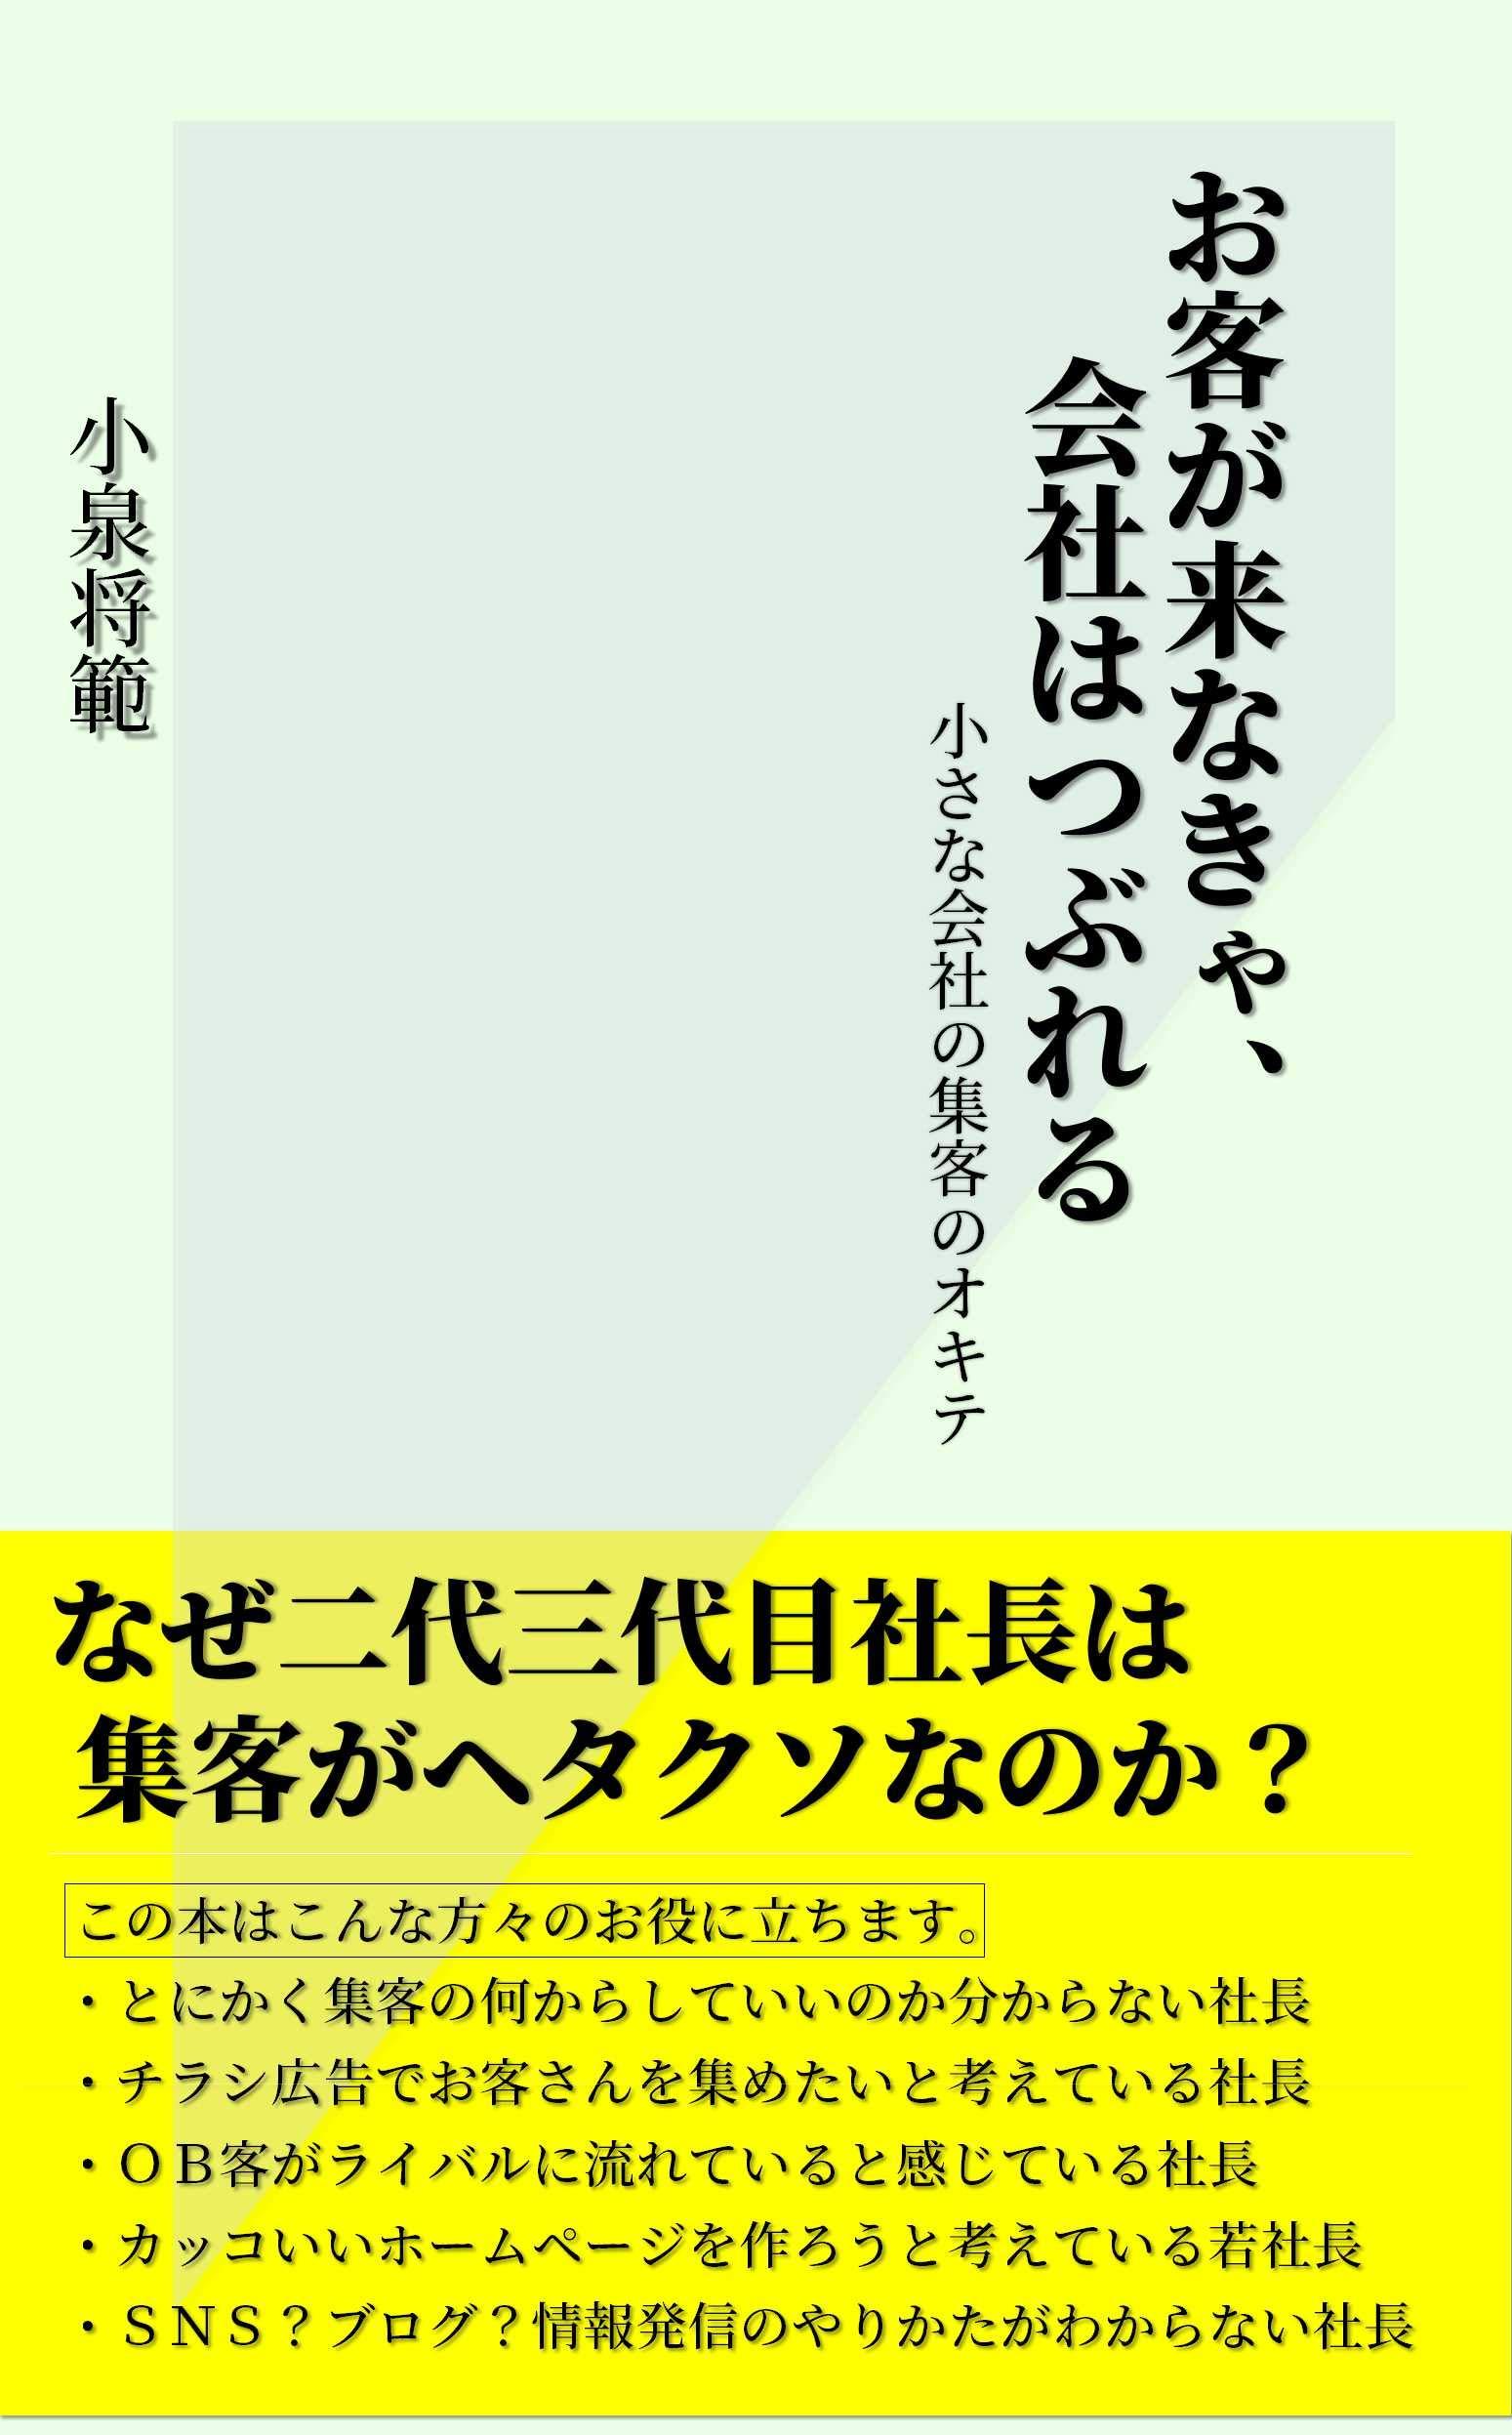 okyakugakonakyakaisyahatuurru: tiisanakaisyanosyuukyakunookite (Japanese Edition)